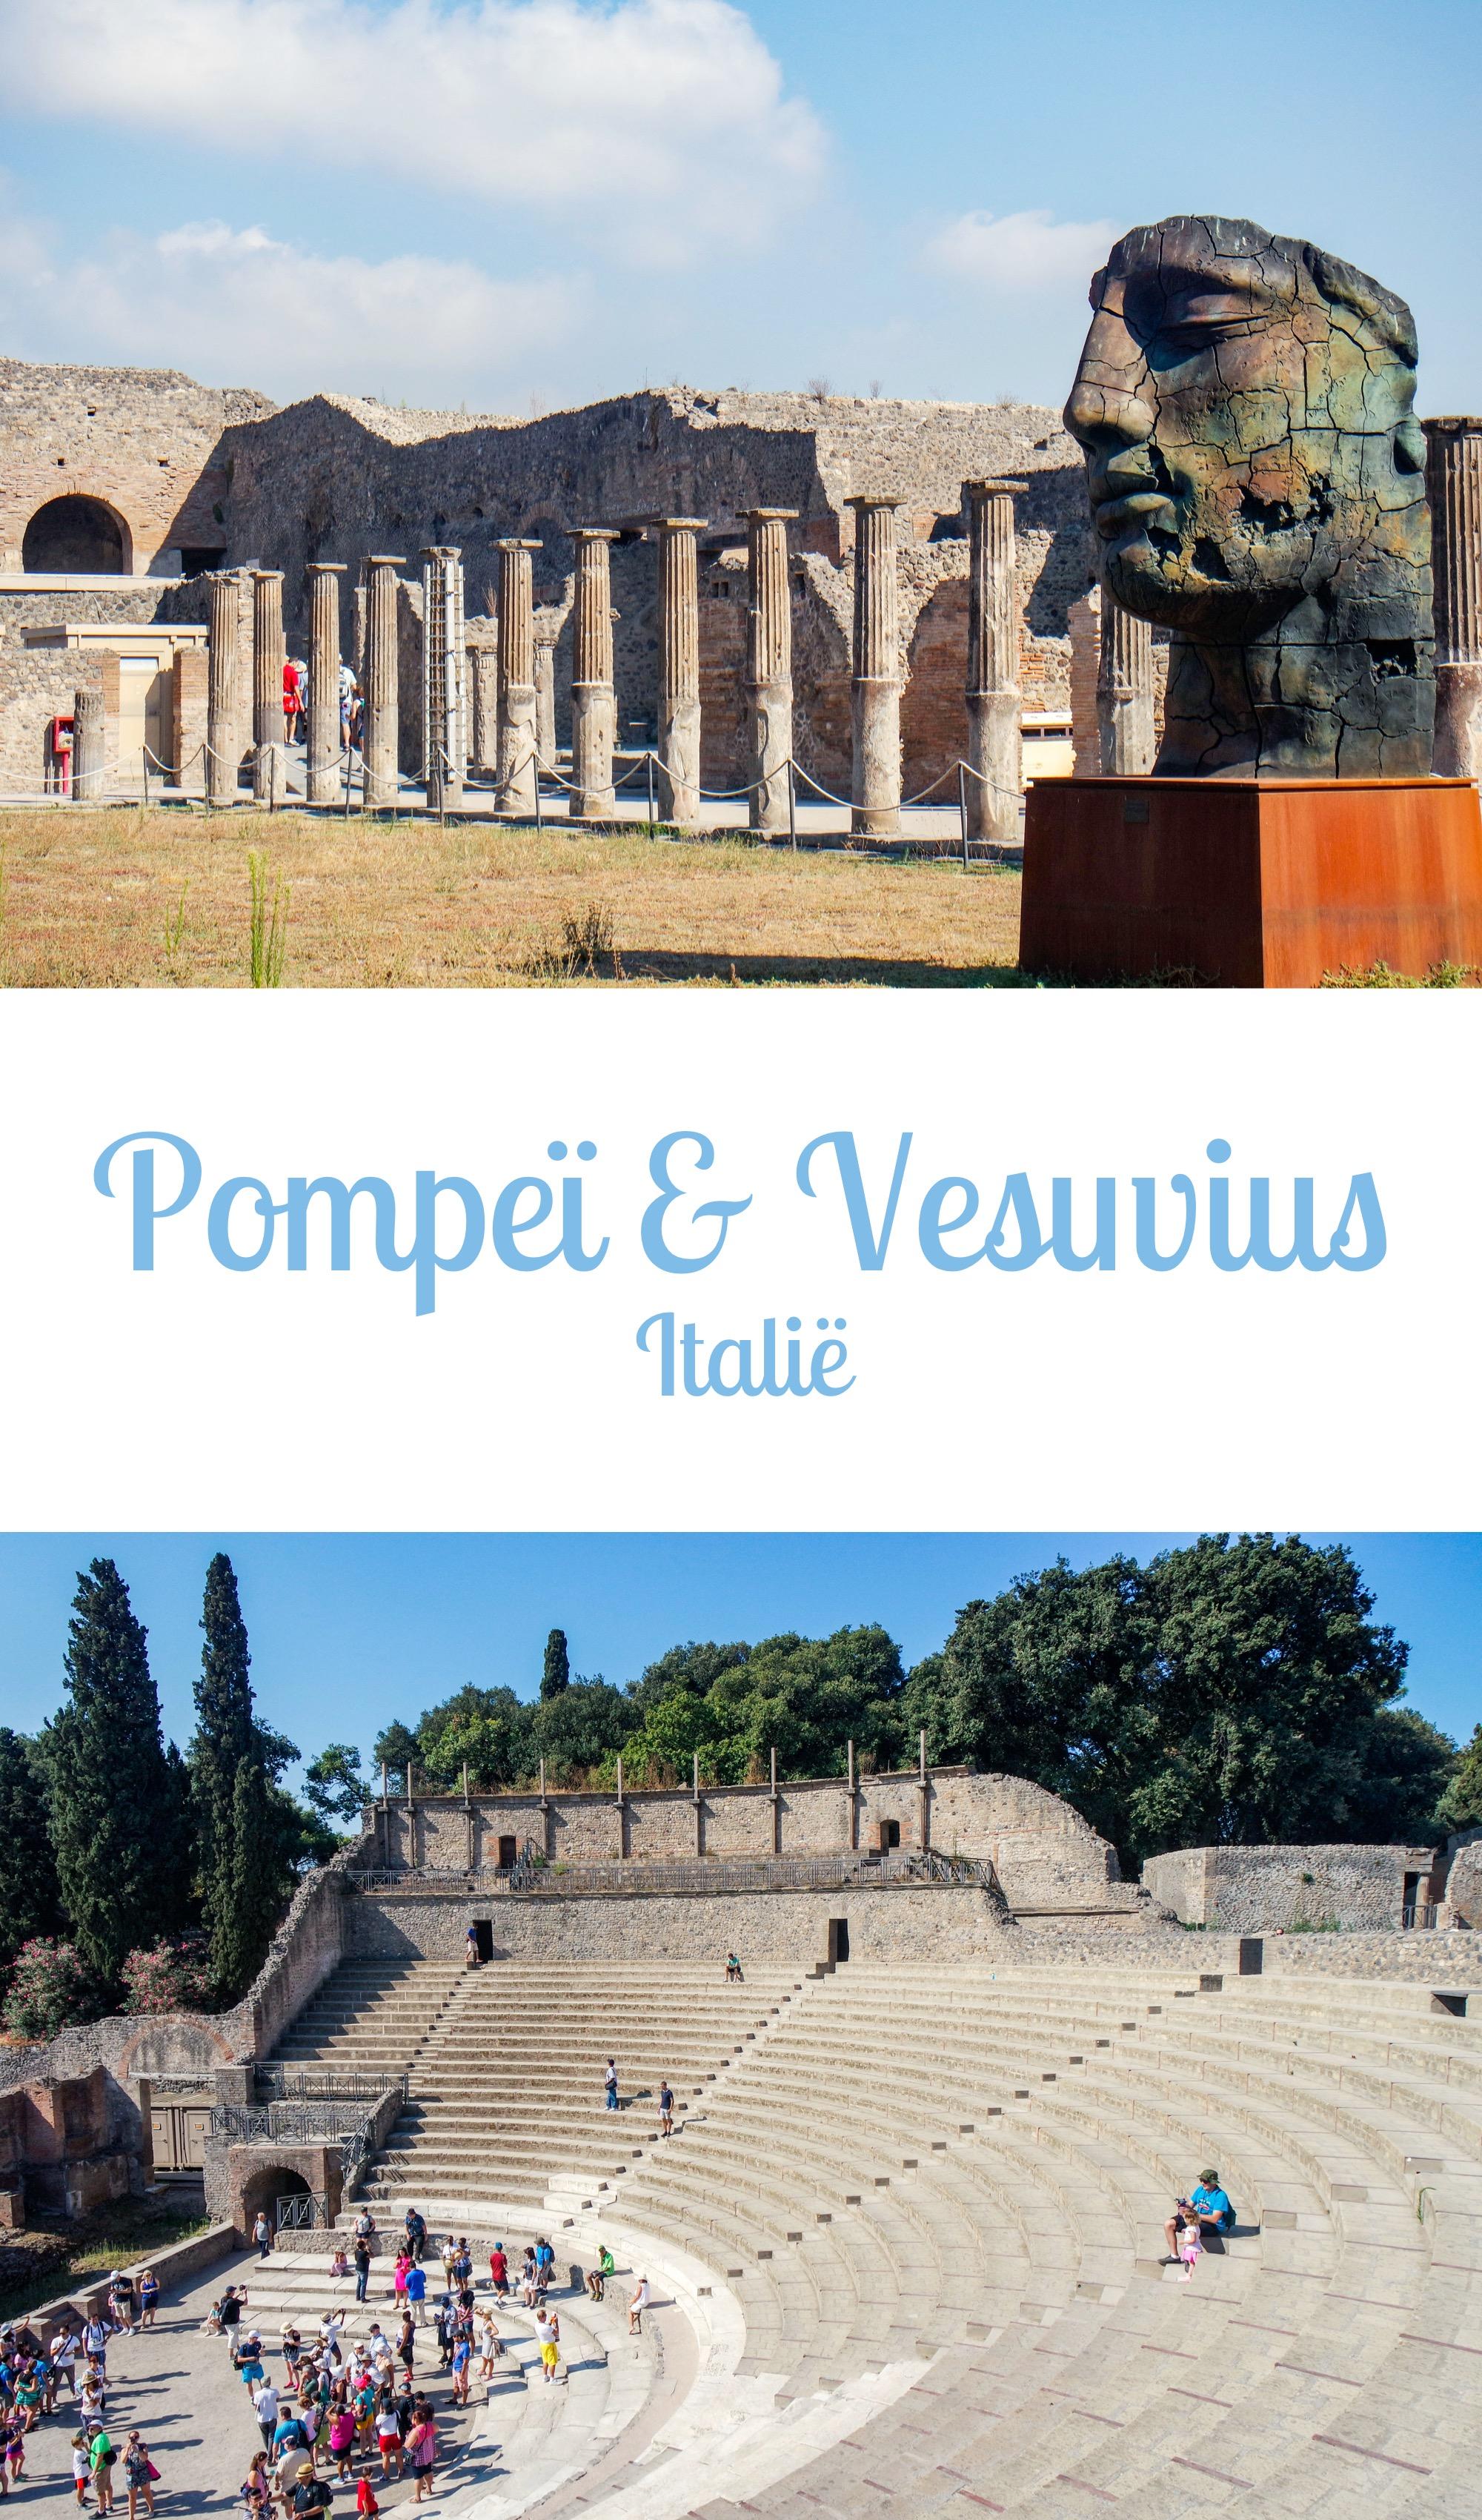 Pompeï & Vesuvius dagtrip